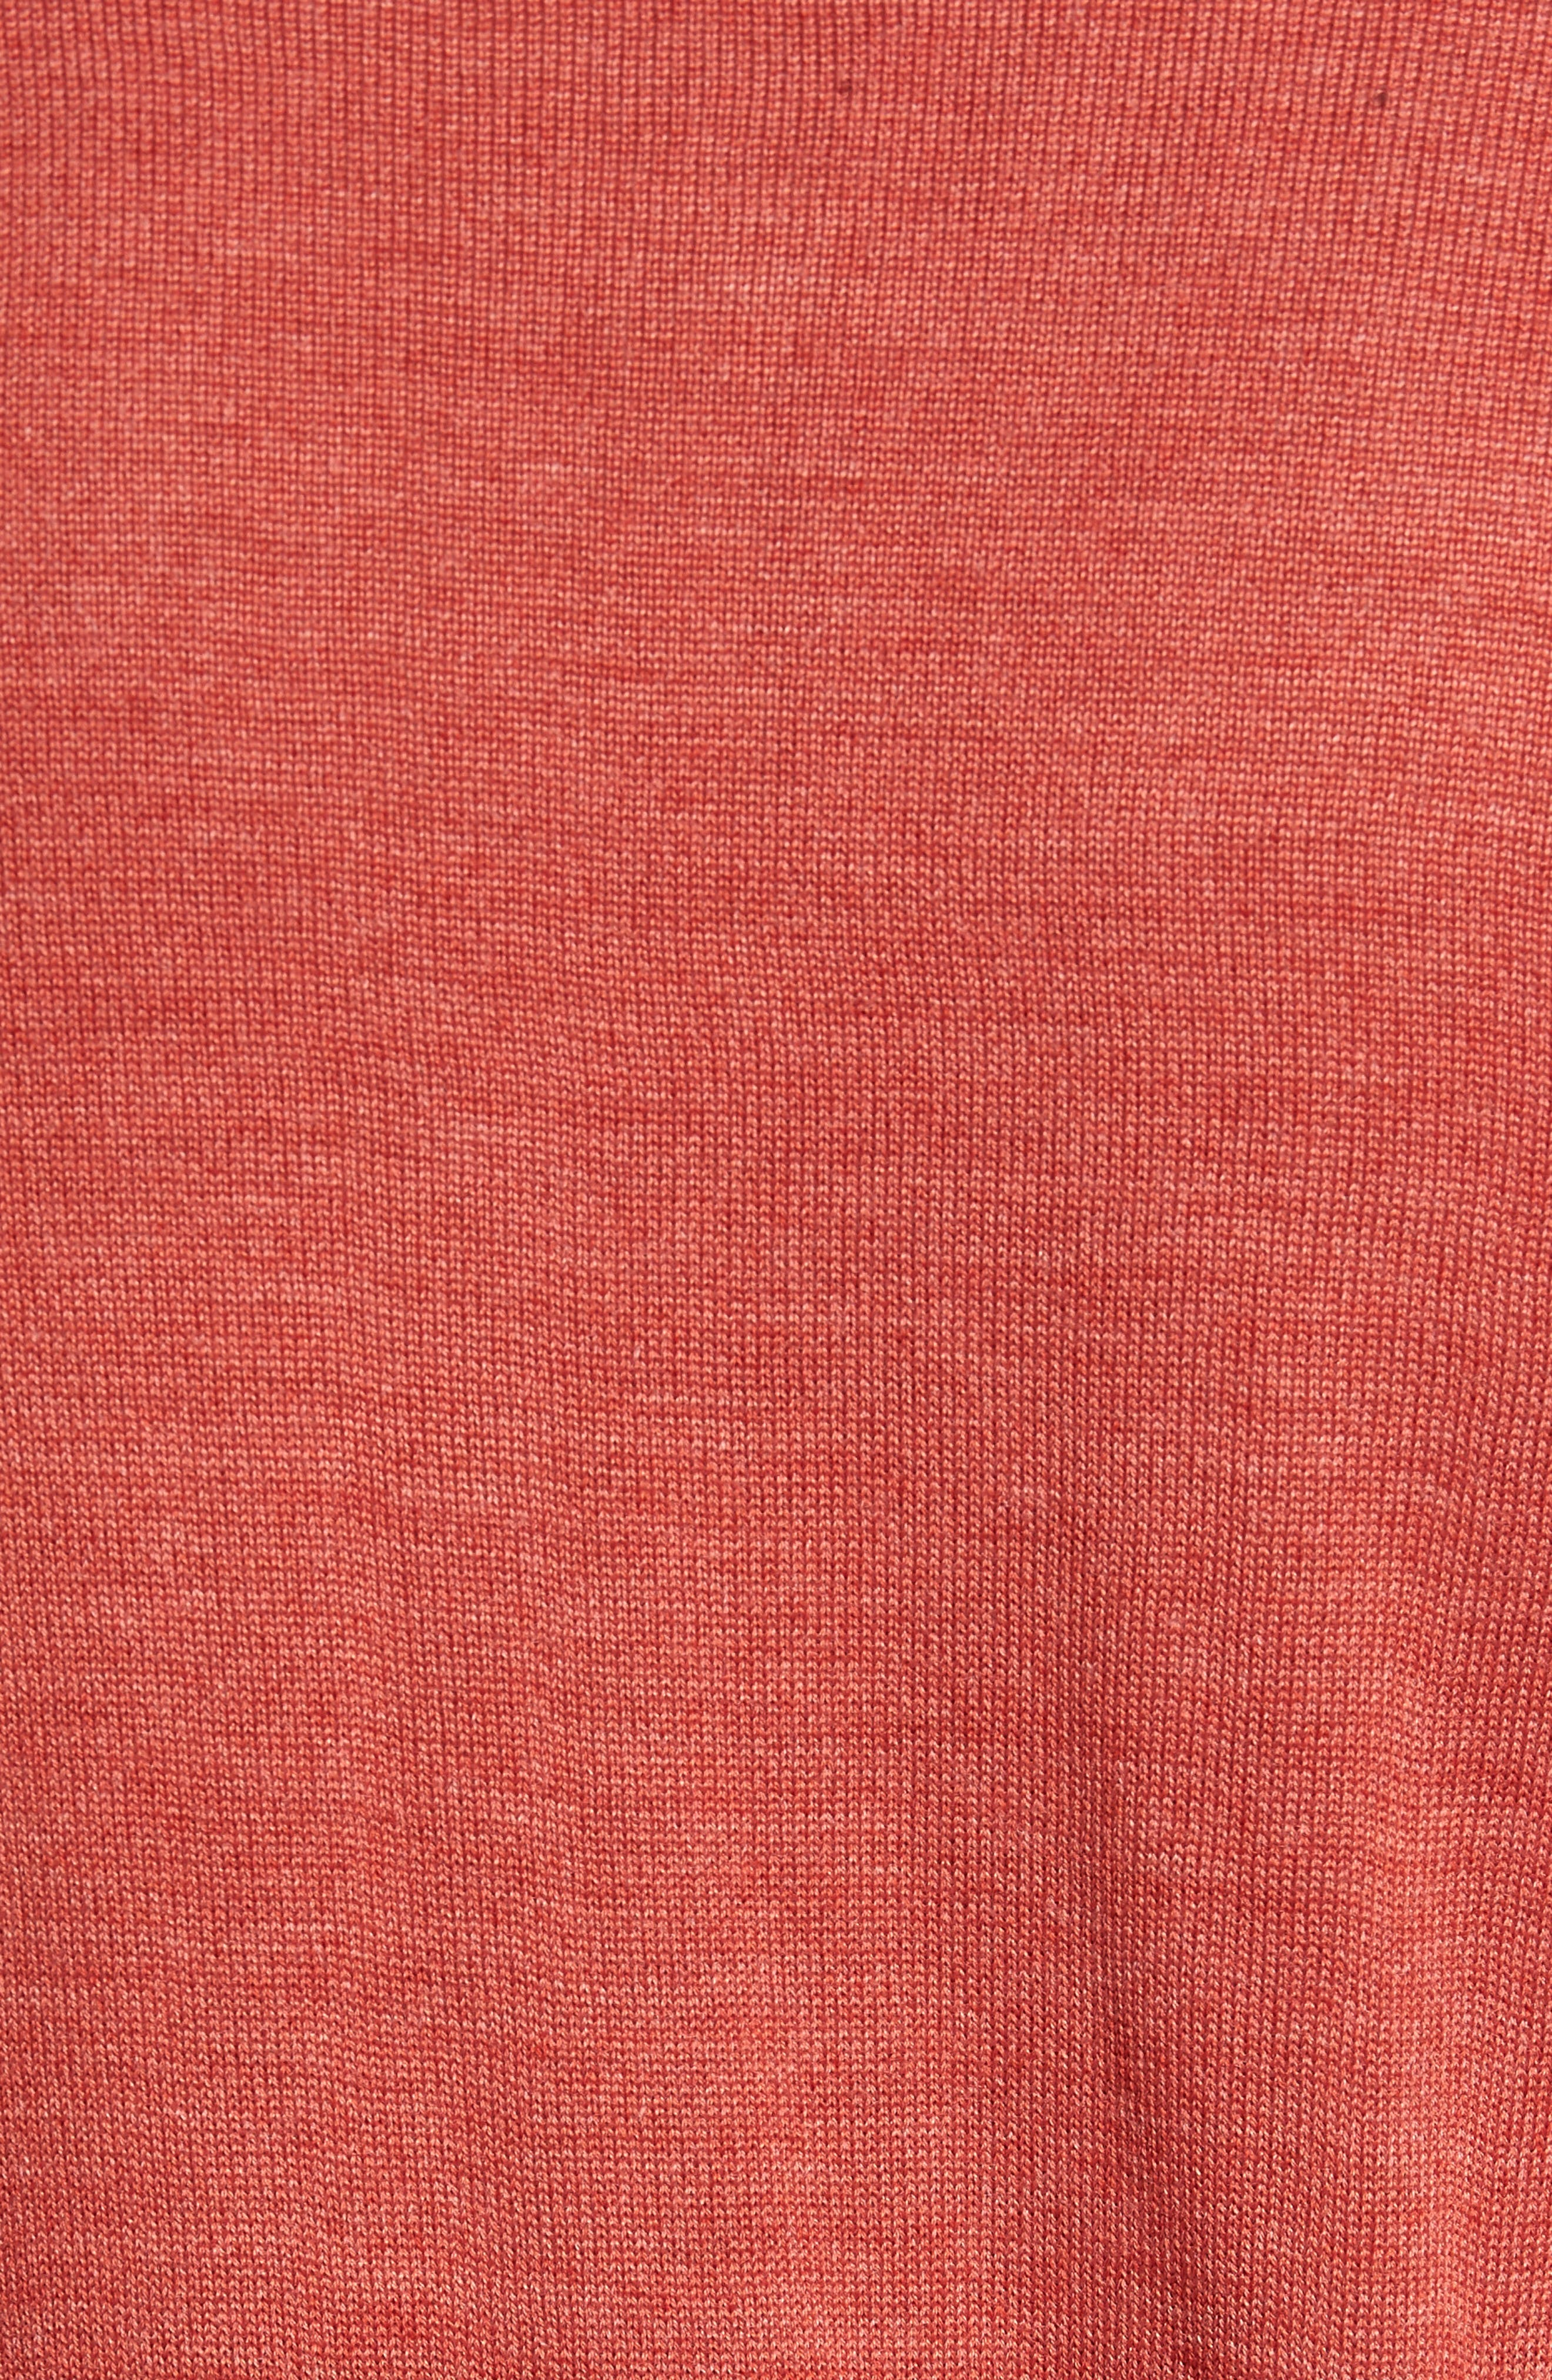 Alternate Image 5  - Cutter & Buck 'Douglas' Merino Wool Blend V-Neck Sweater (Online Only)